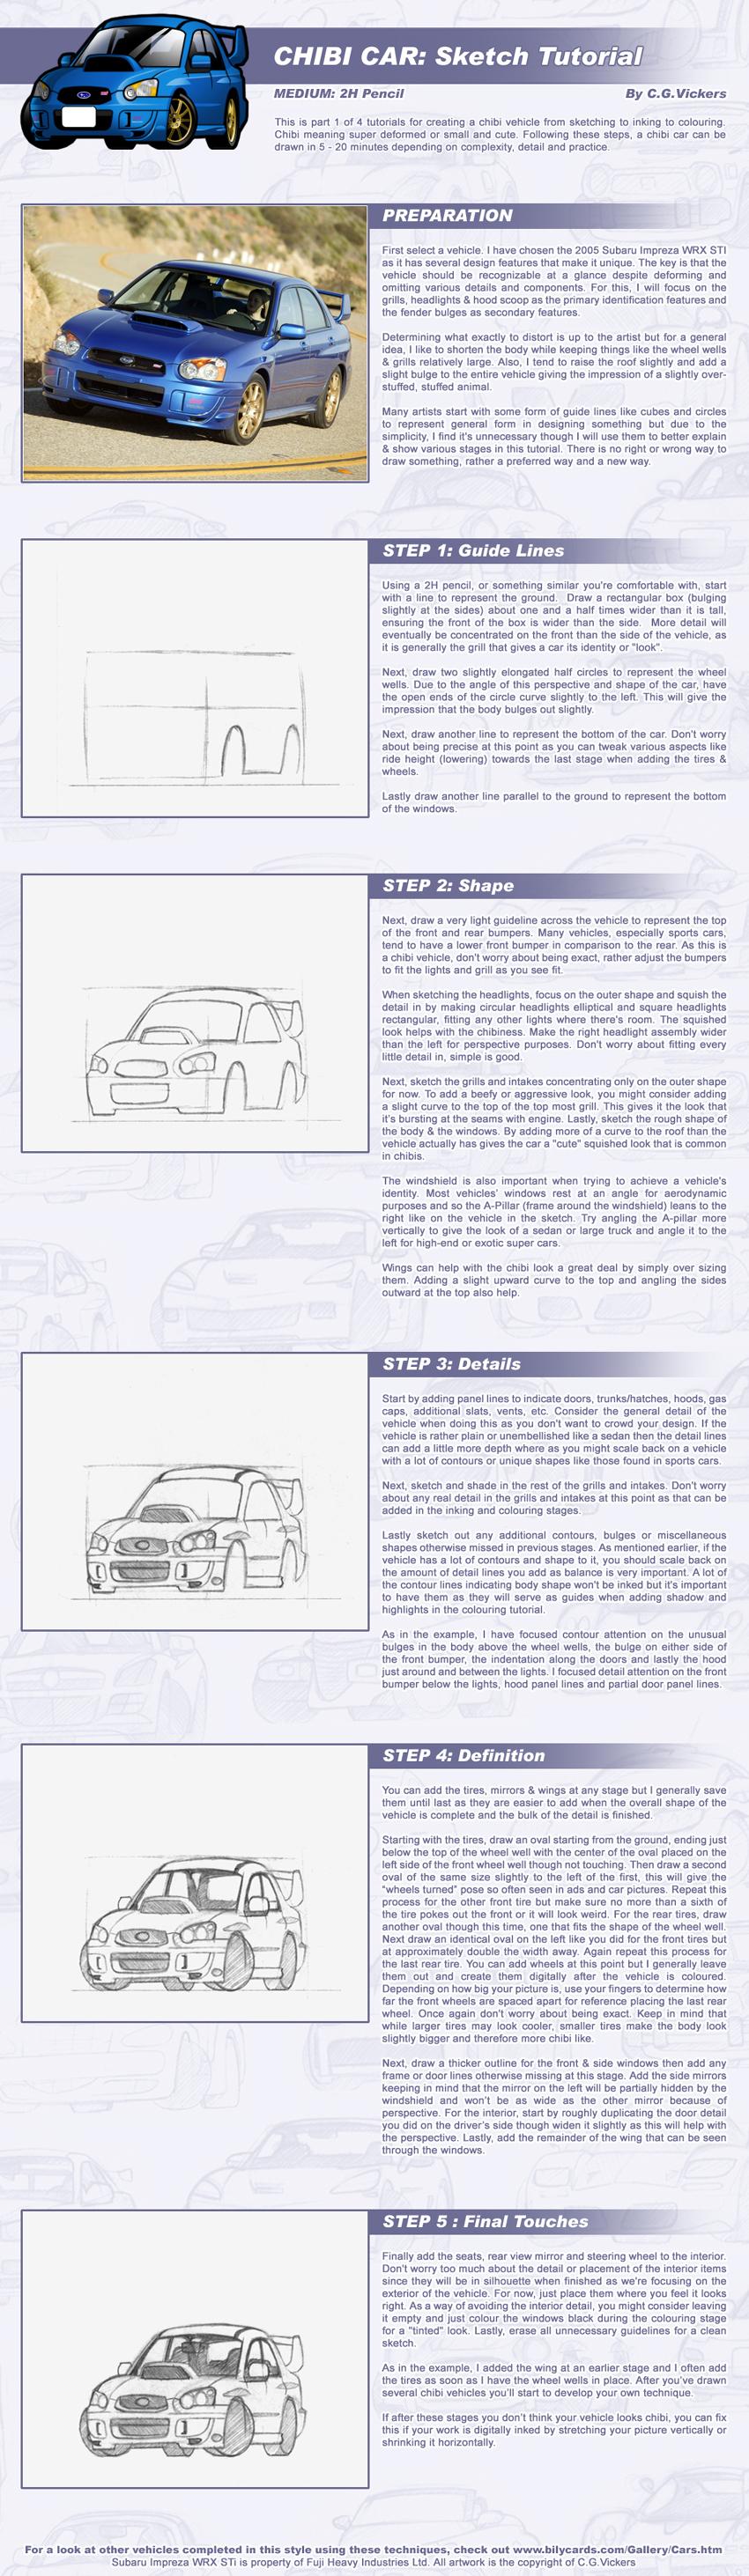 Chibi Car - Sketch Tutorial by CGVickers on DeviantArt